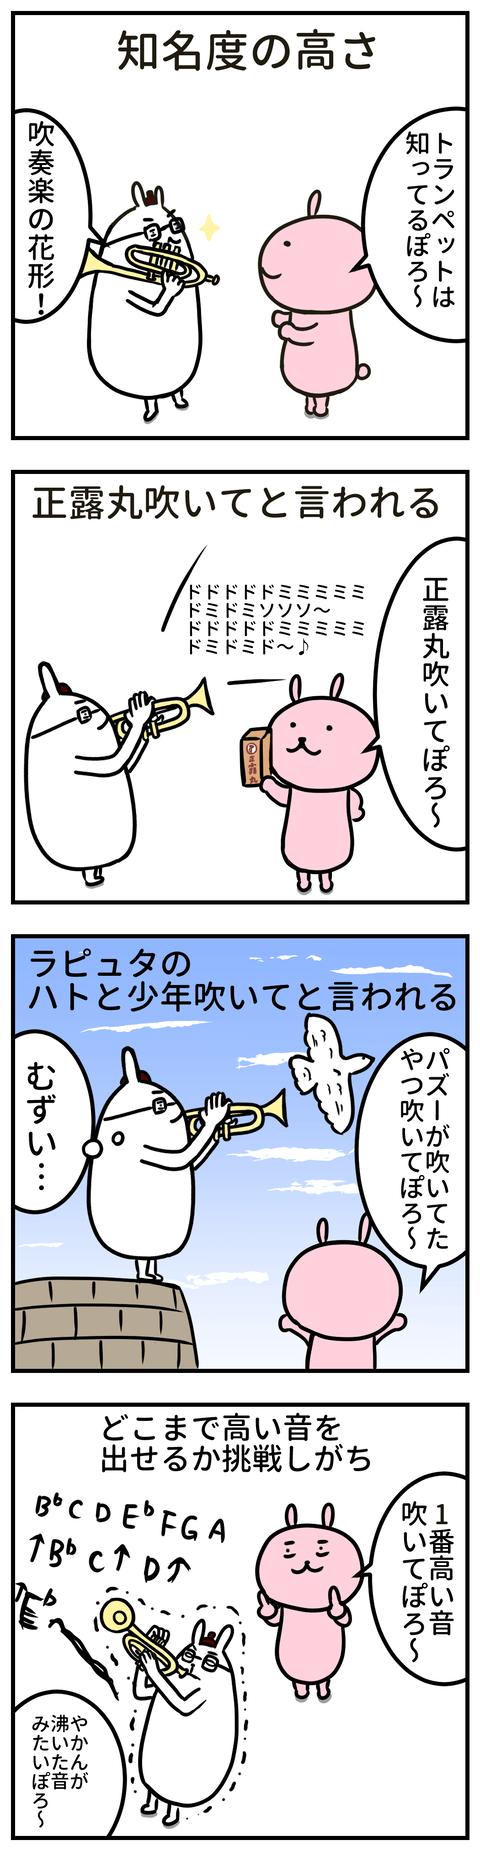 manga-yuzuporo71-1